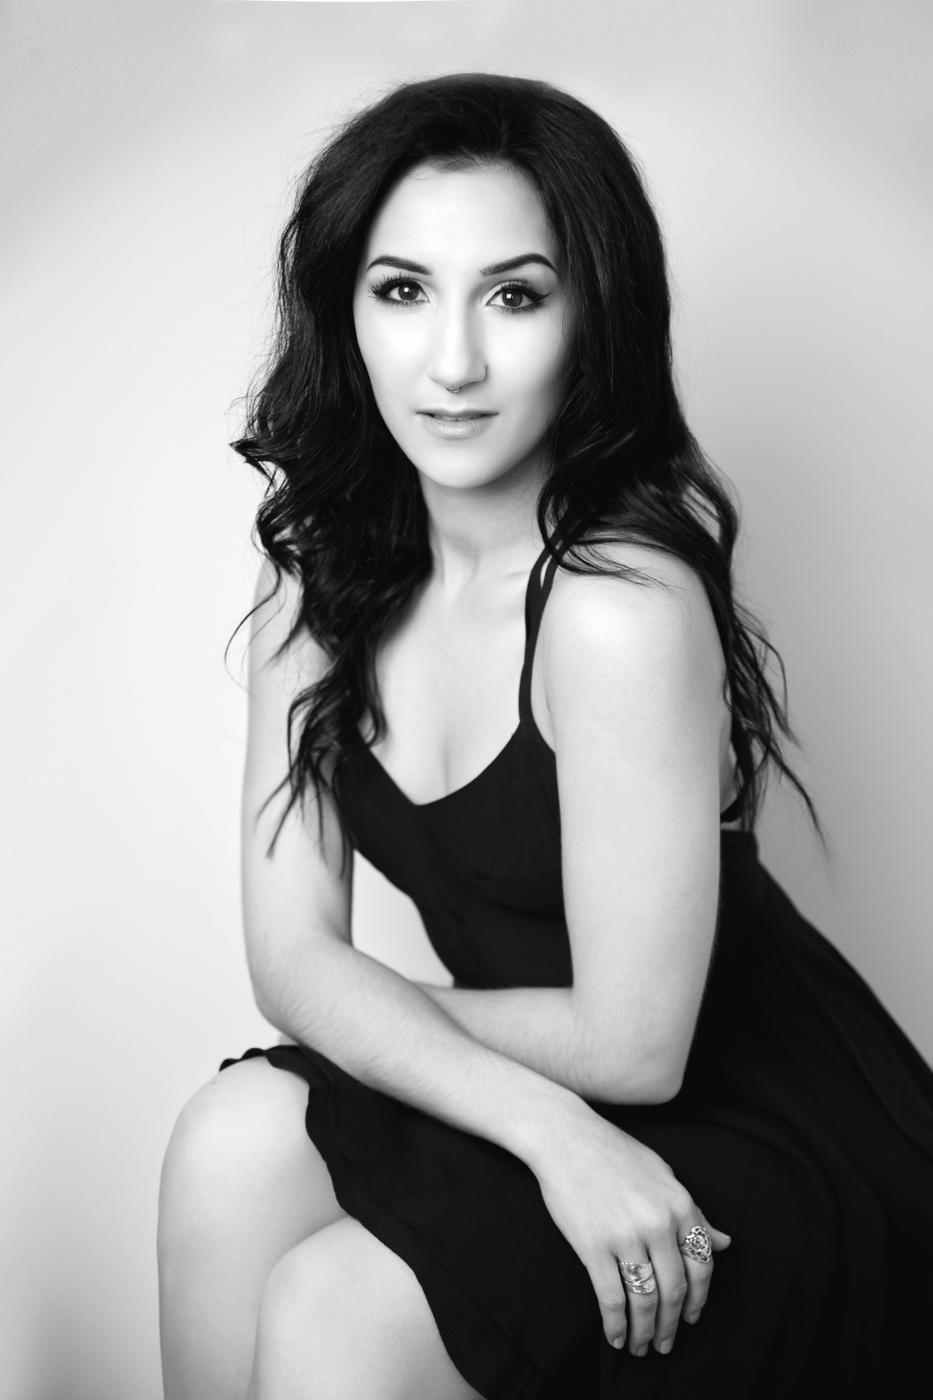 Jessica-Daniel-Engagement-Photo-Shoot-in-the-heart-of-Washington-DC-Ksenia-Pro-Photography-4